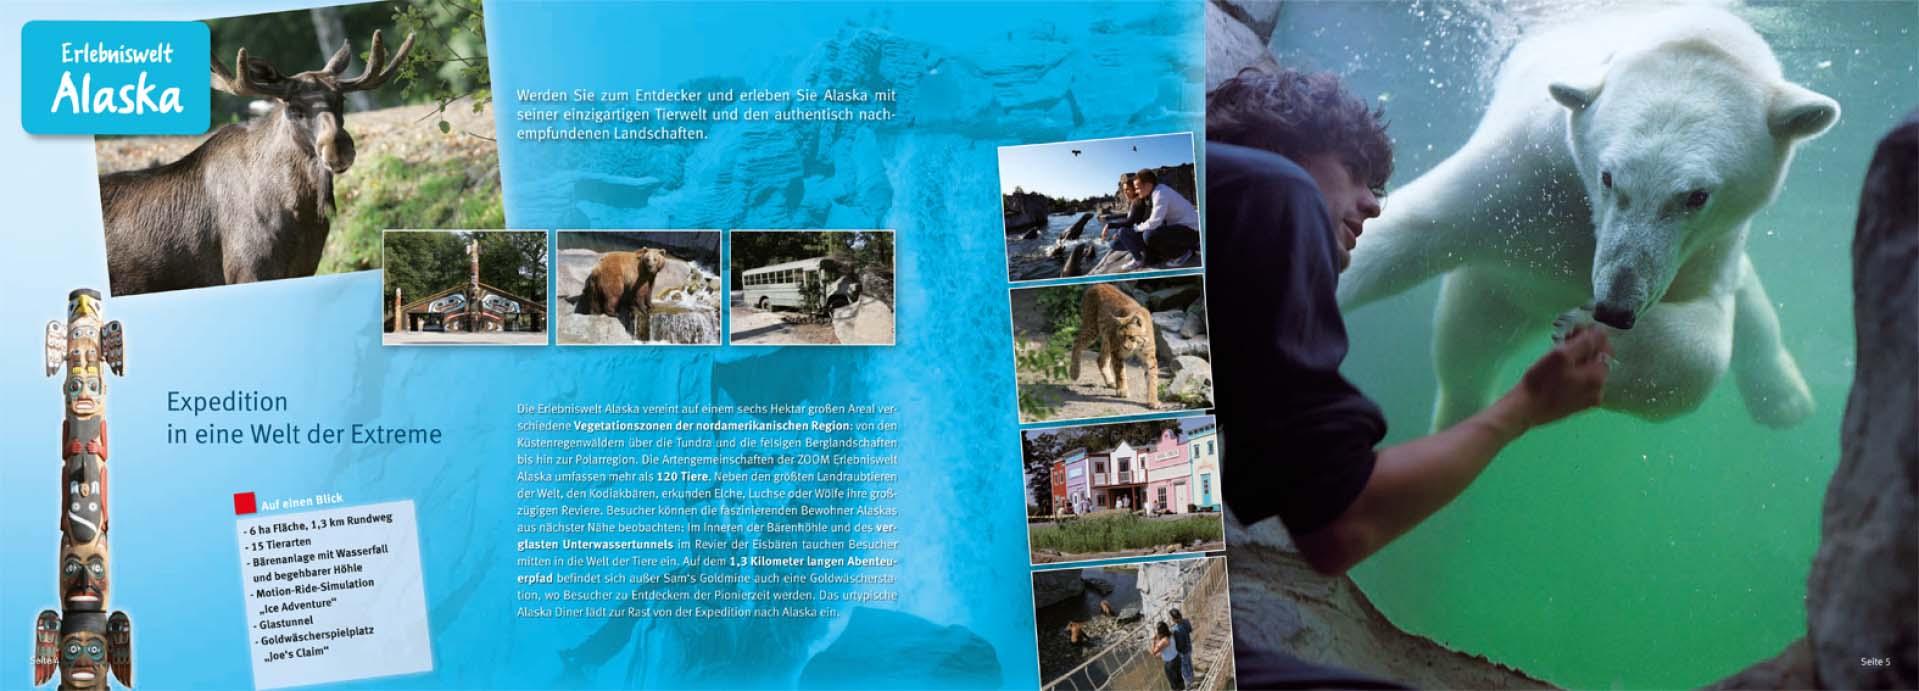 Erlebniswelt Alaska, Inhalt der Gruppenbroschüre der ZOOM Erlebniswelt